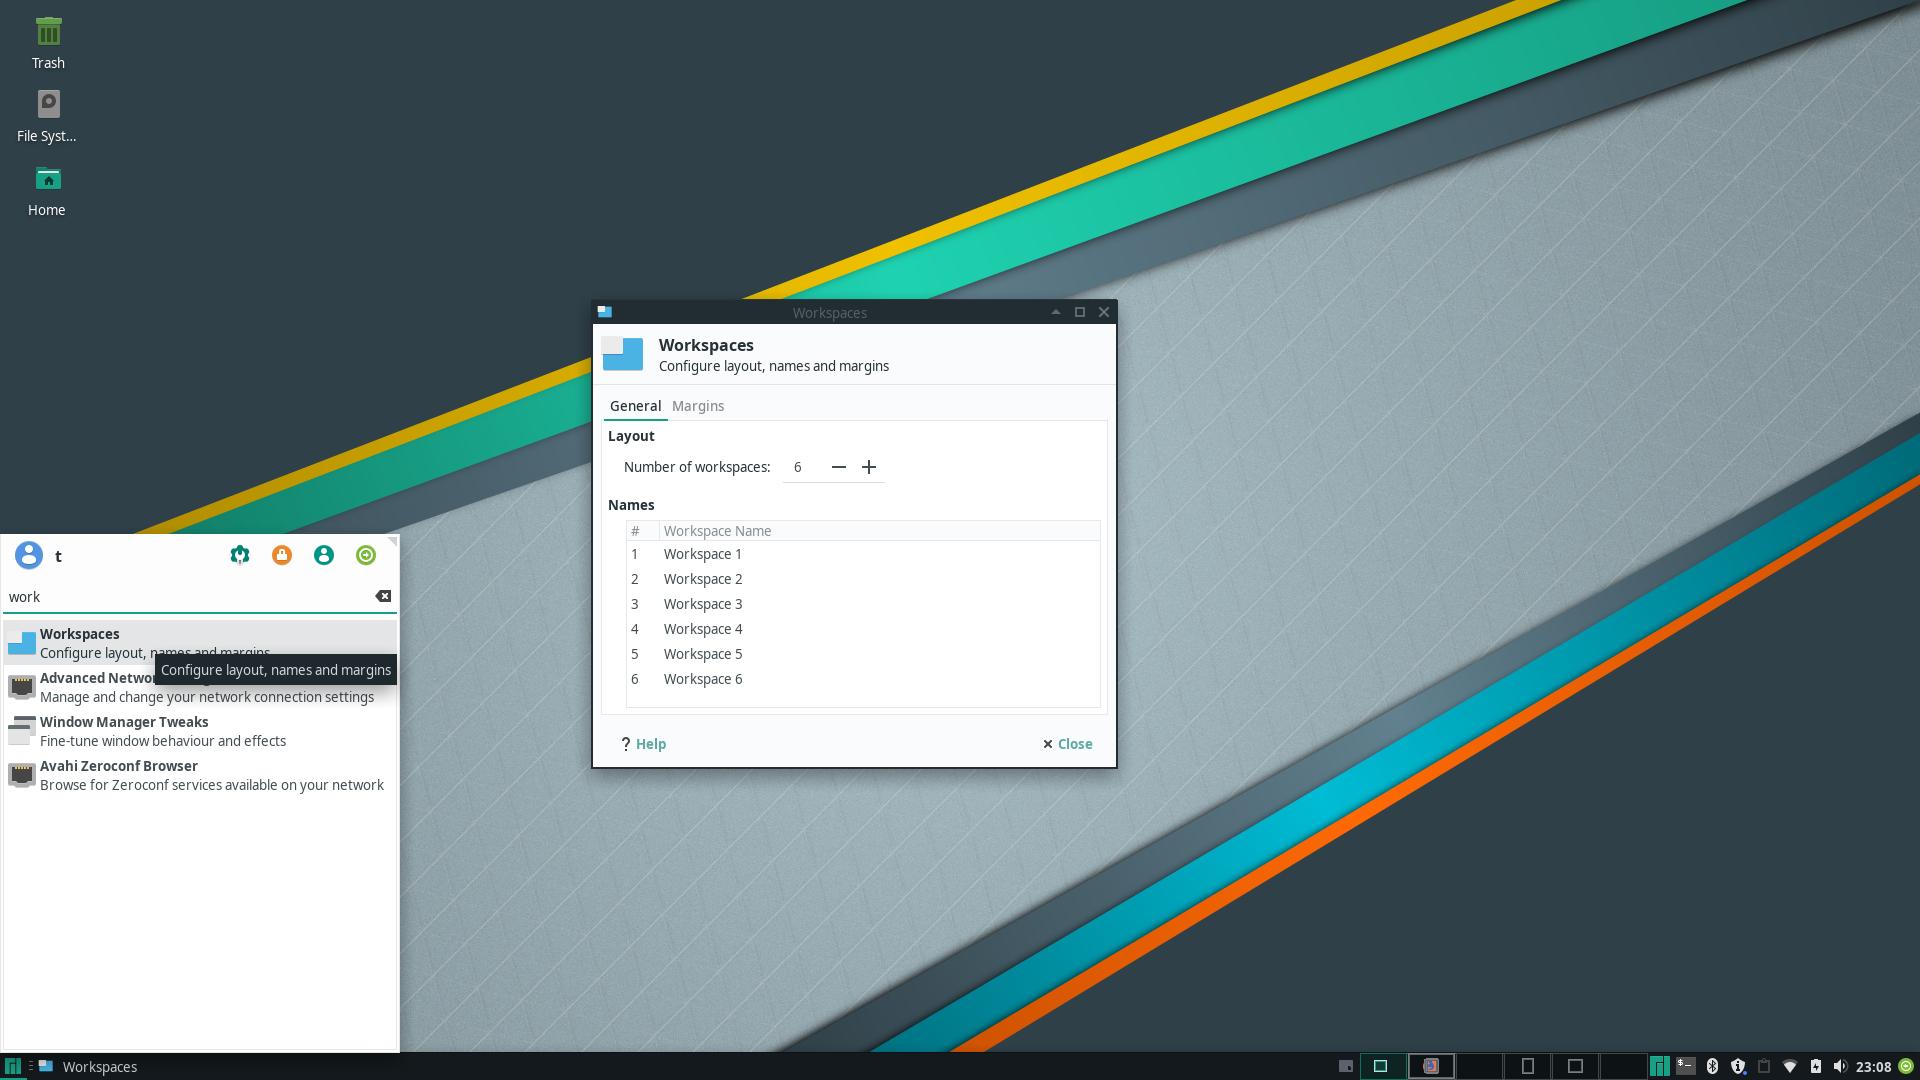 Visualized Desktop Workspace flow in Manjaro linux 18 - XFCE